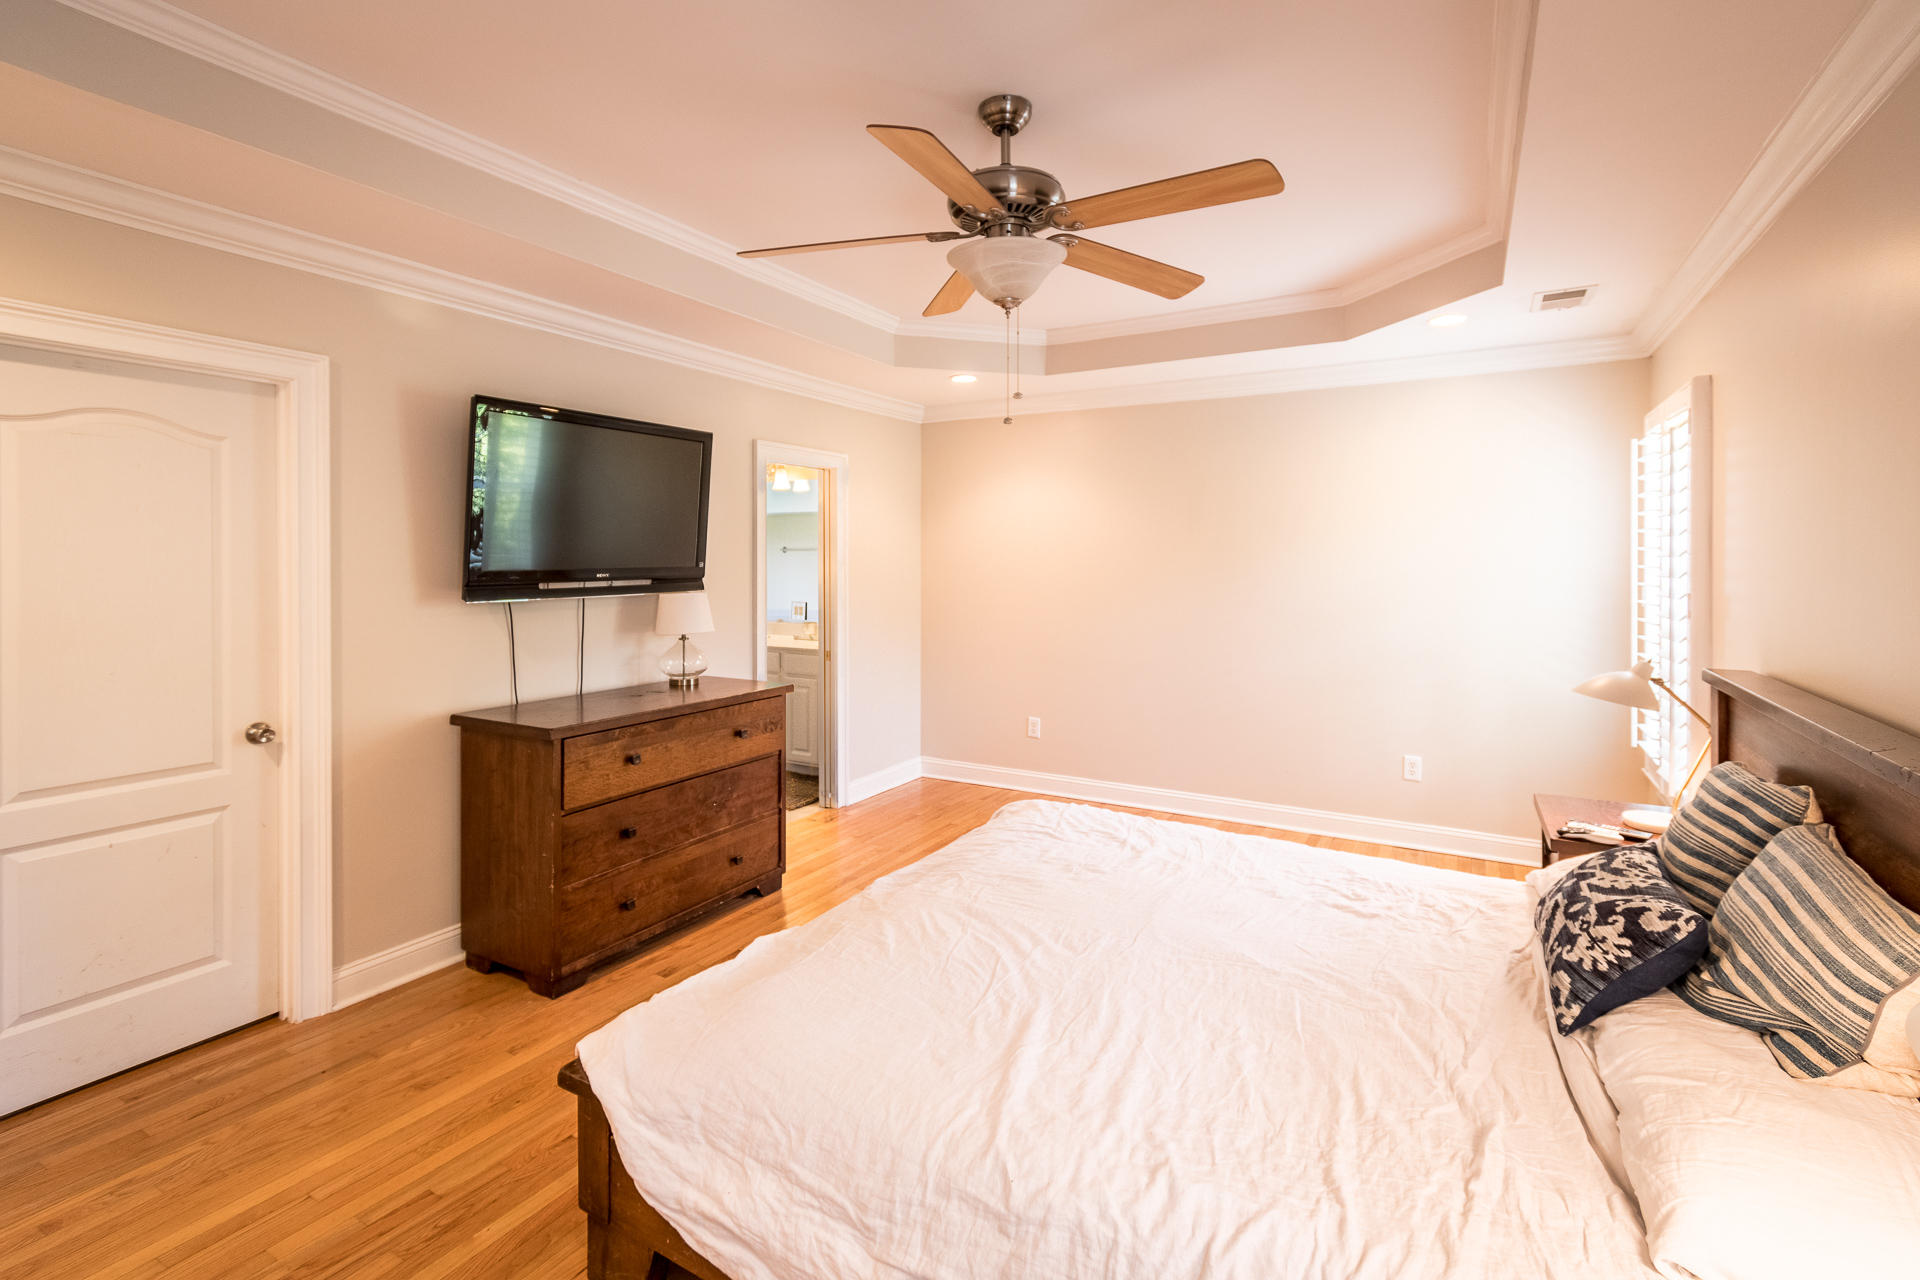 Stoneboro Shores Homes For Sale - 656 Stoneboro, Charleston, SC - 15